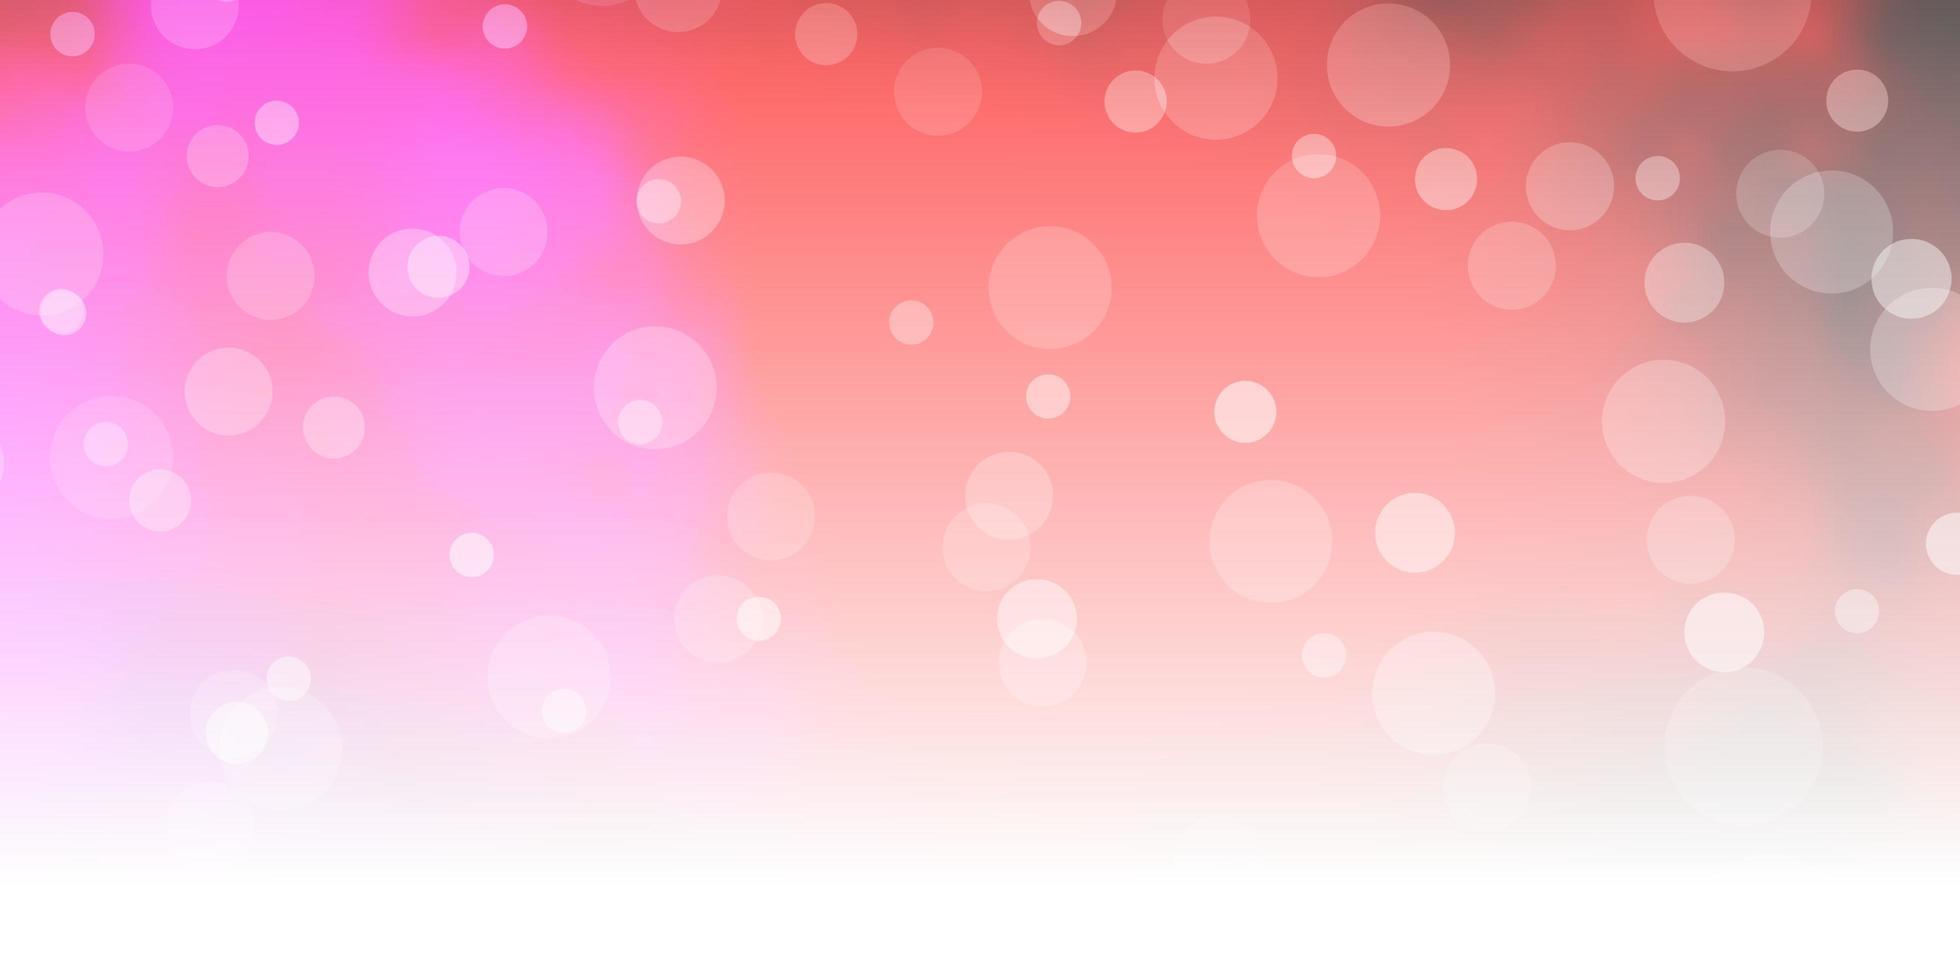 pano de fundo vector rosa e amarelo escuro com círculos.